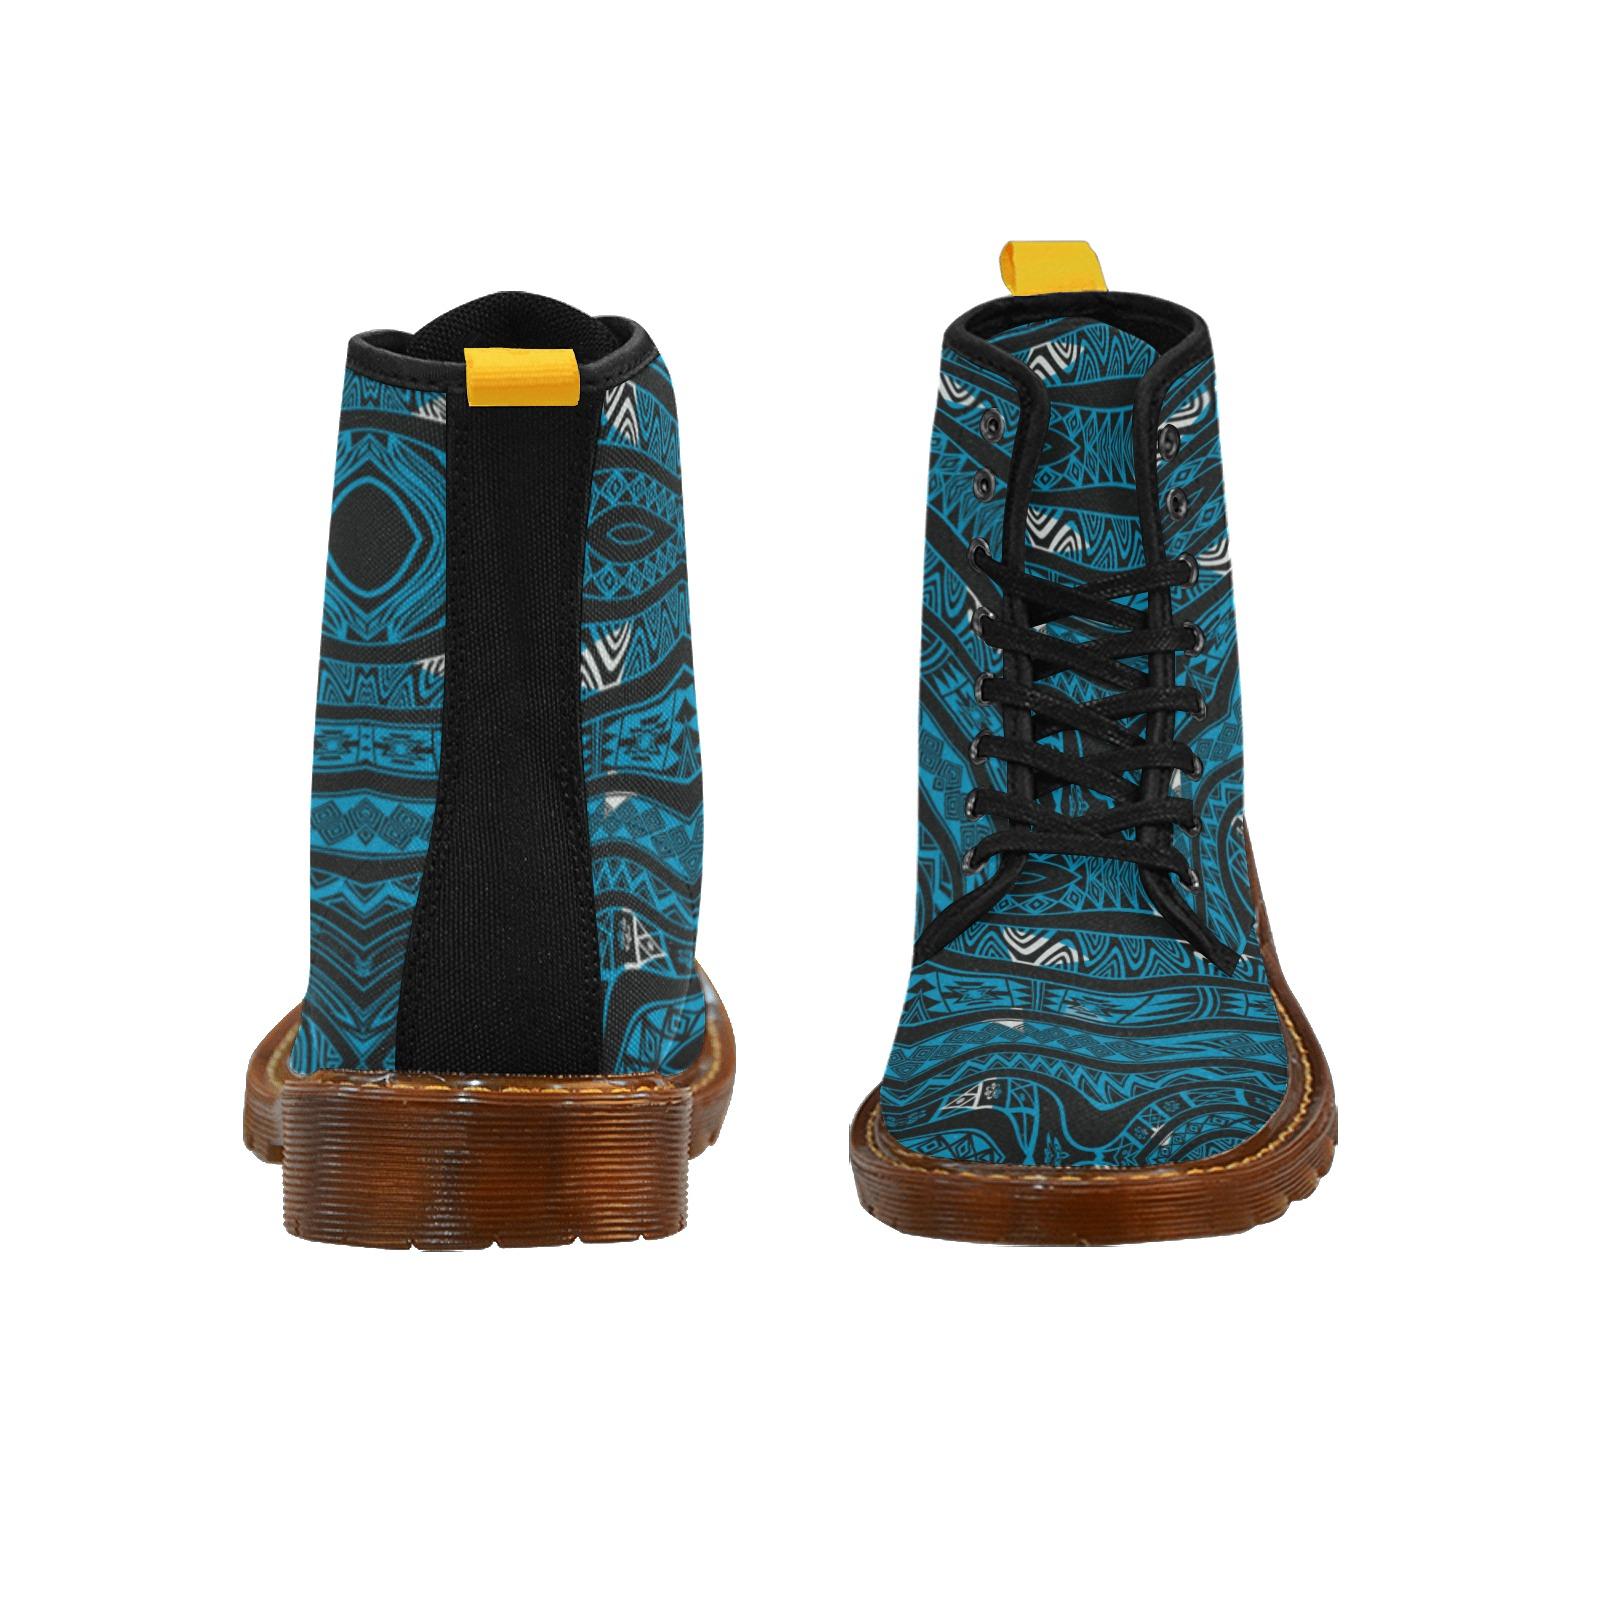 Tribal Martin Boots For Women Model 1203H